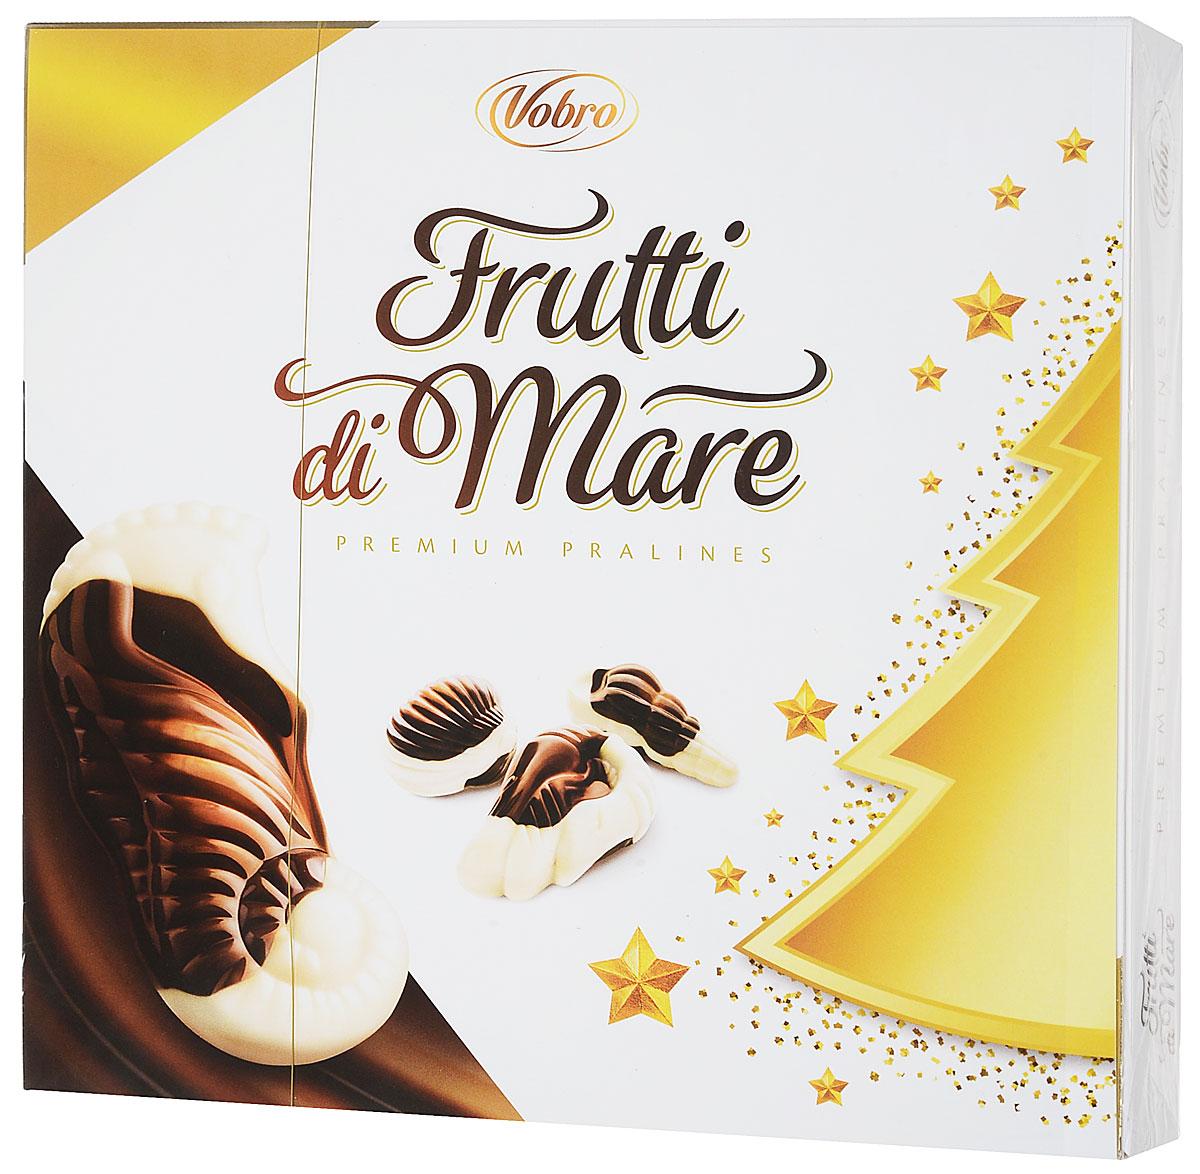 Vobro Frutti di Mare набор шоколадных конфет в виде морских ракушек, 225 г loacker vanille вафли 225 г